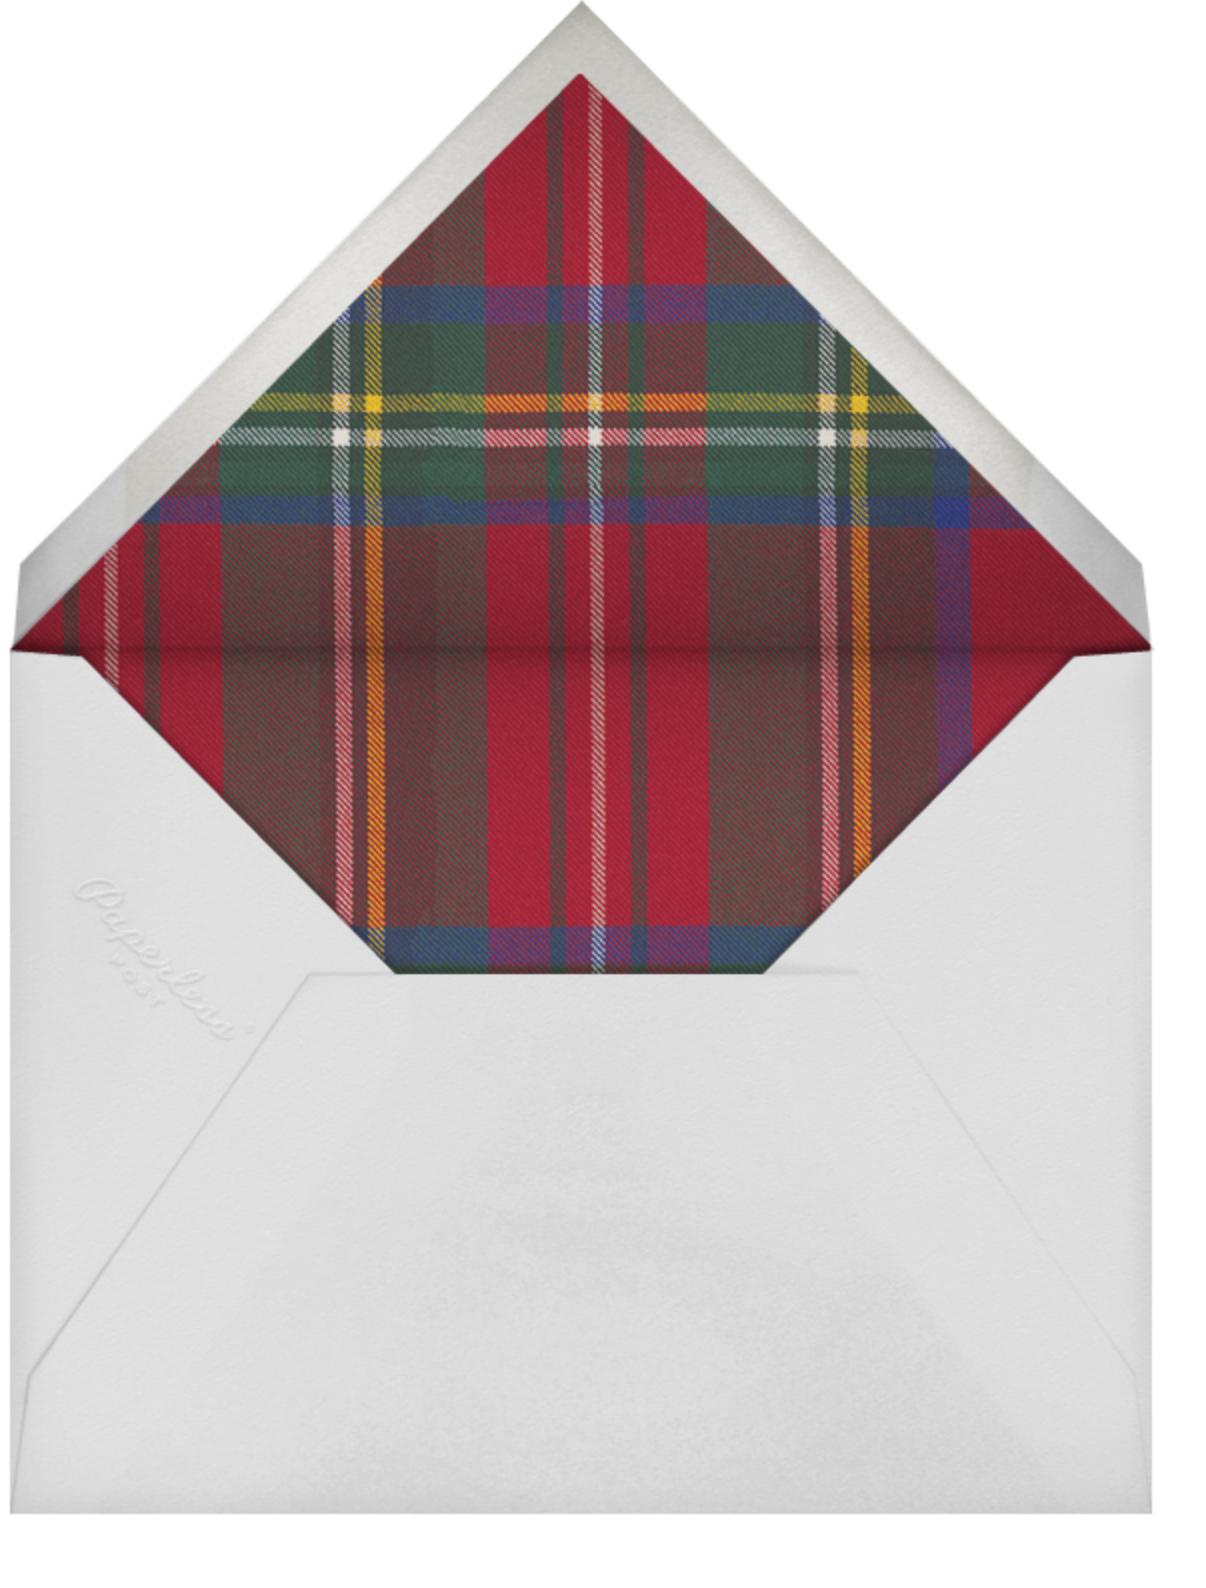 Tartan (Horizontal Photo) - Carnation - Oscar de la Renta - Holiday cards - envelope back